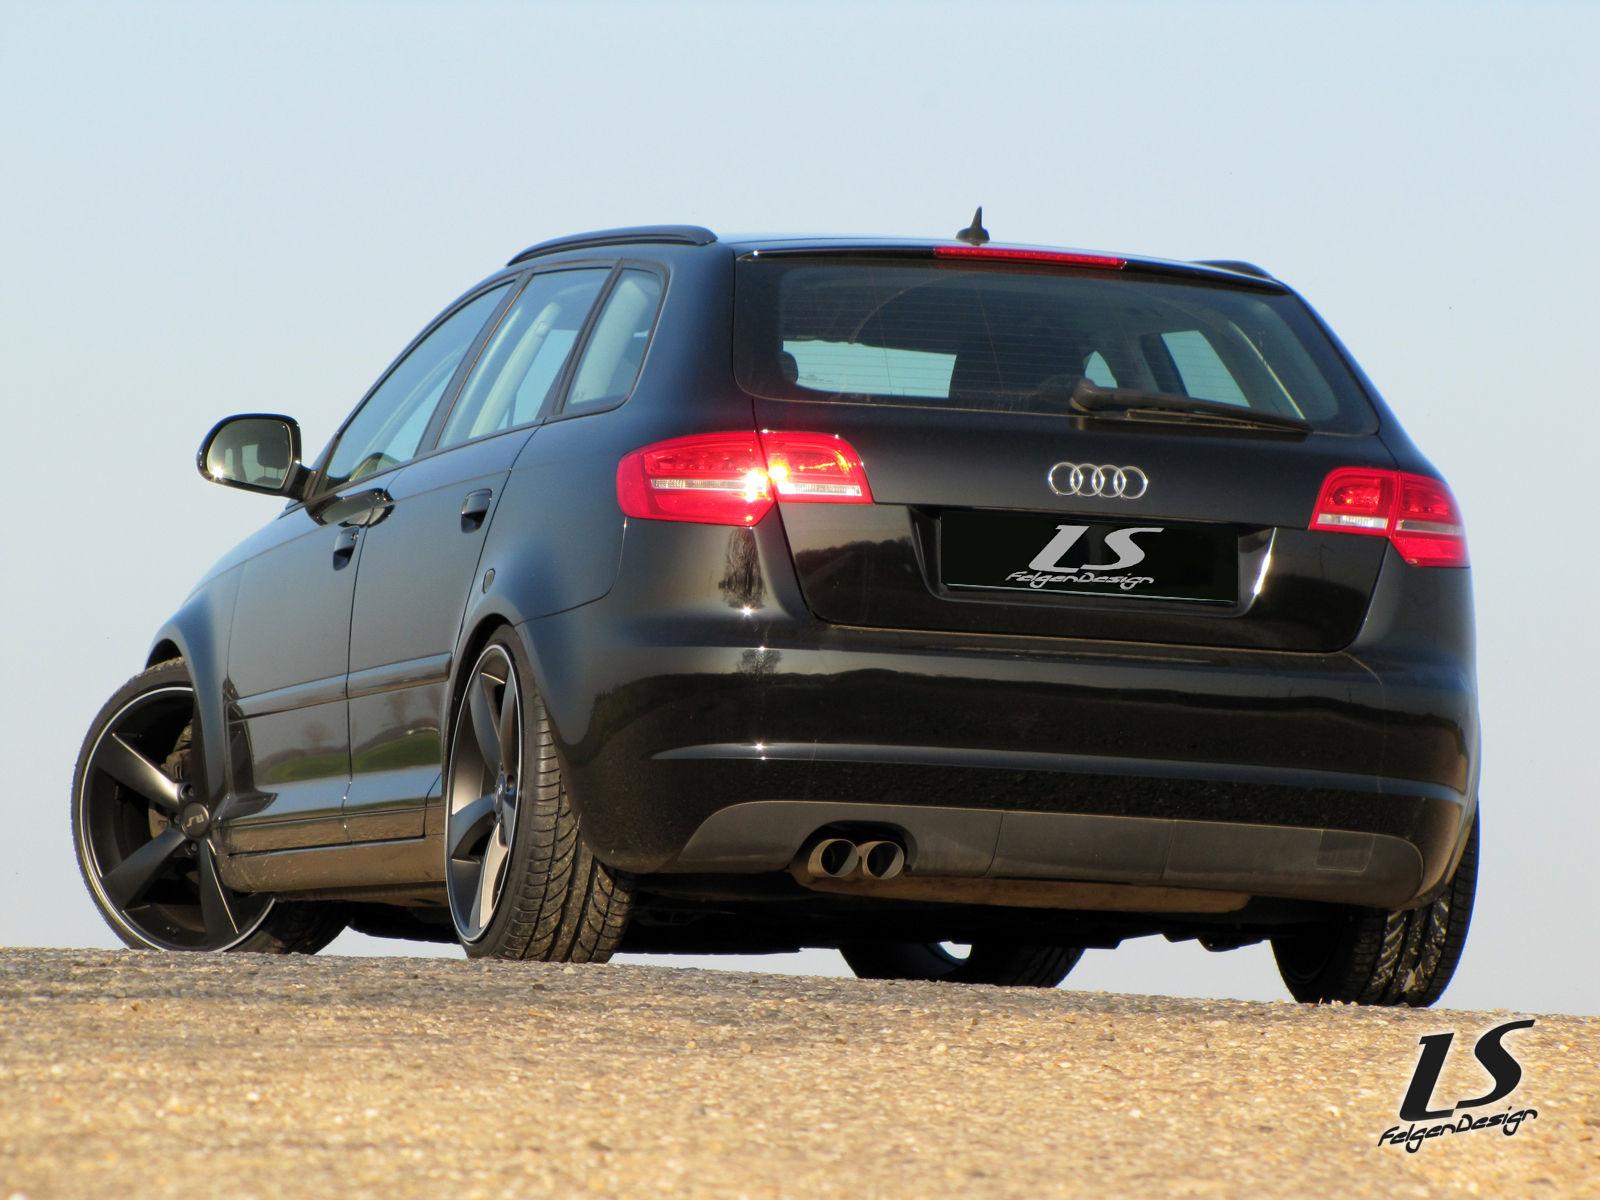 Audi Felgen 2014 Audi a3 s3 Rs3 2014 8v 8p 8pa